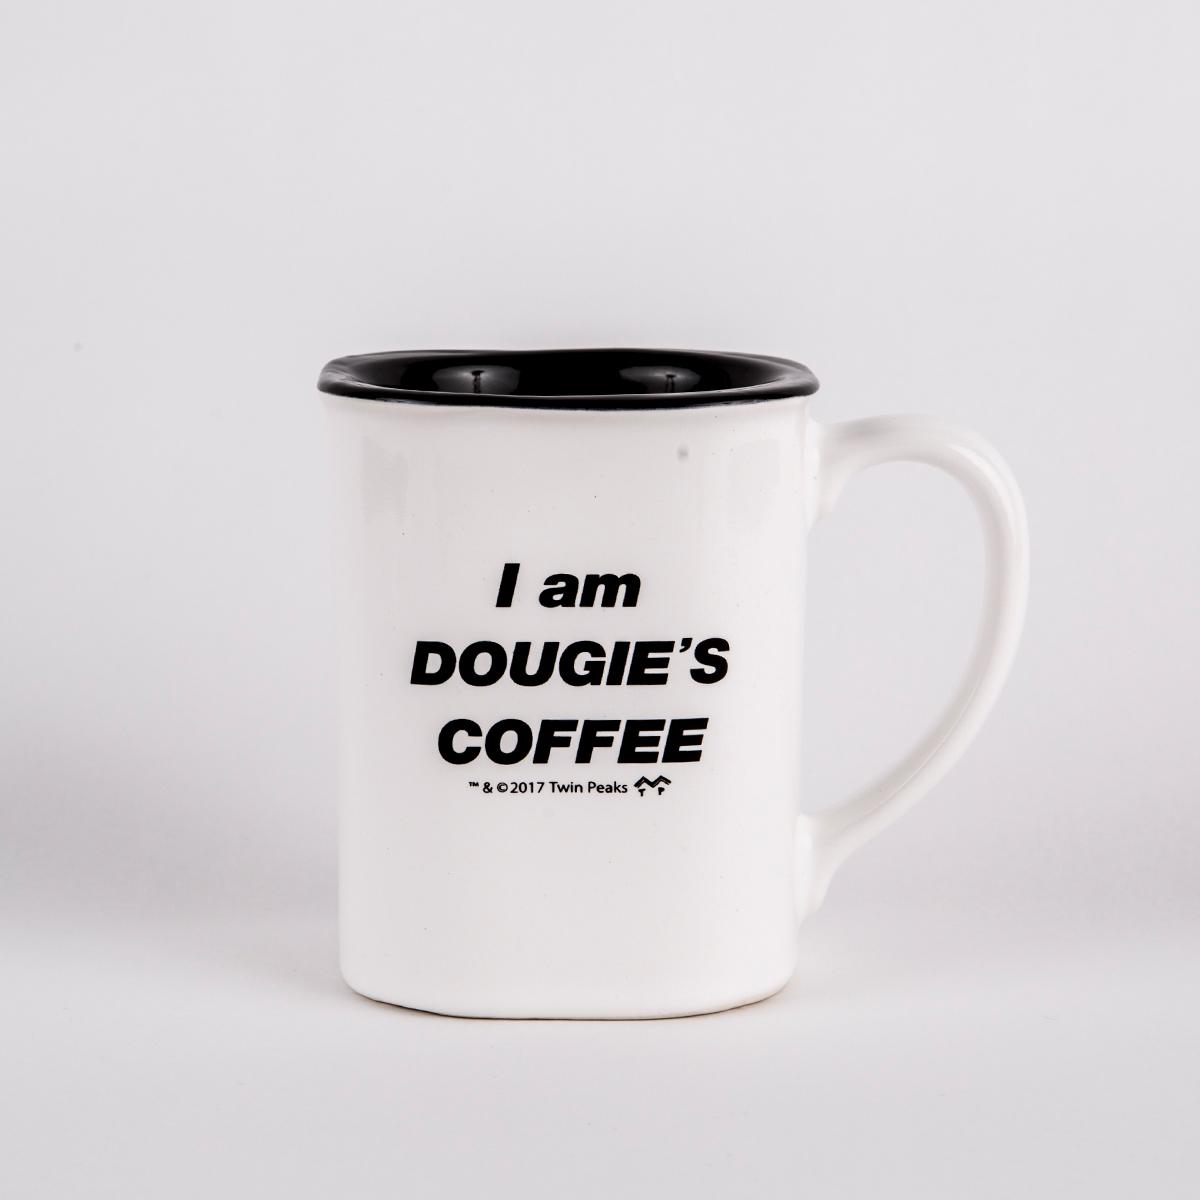 UPC 603307968761 product image for Twin Peaks Dougie's Coffee Mug | upcitemdb.com